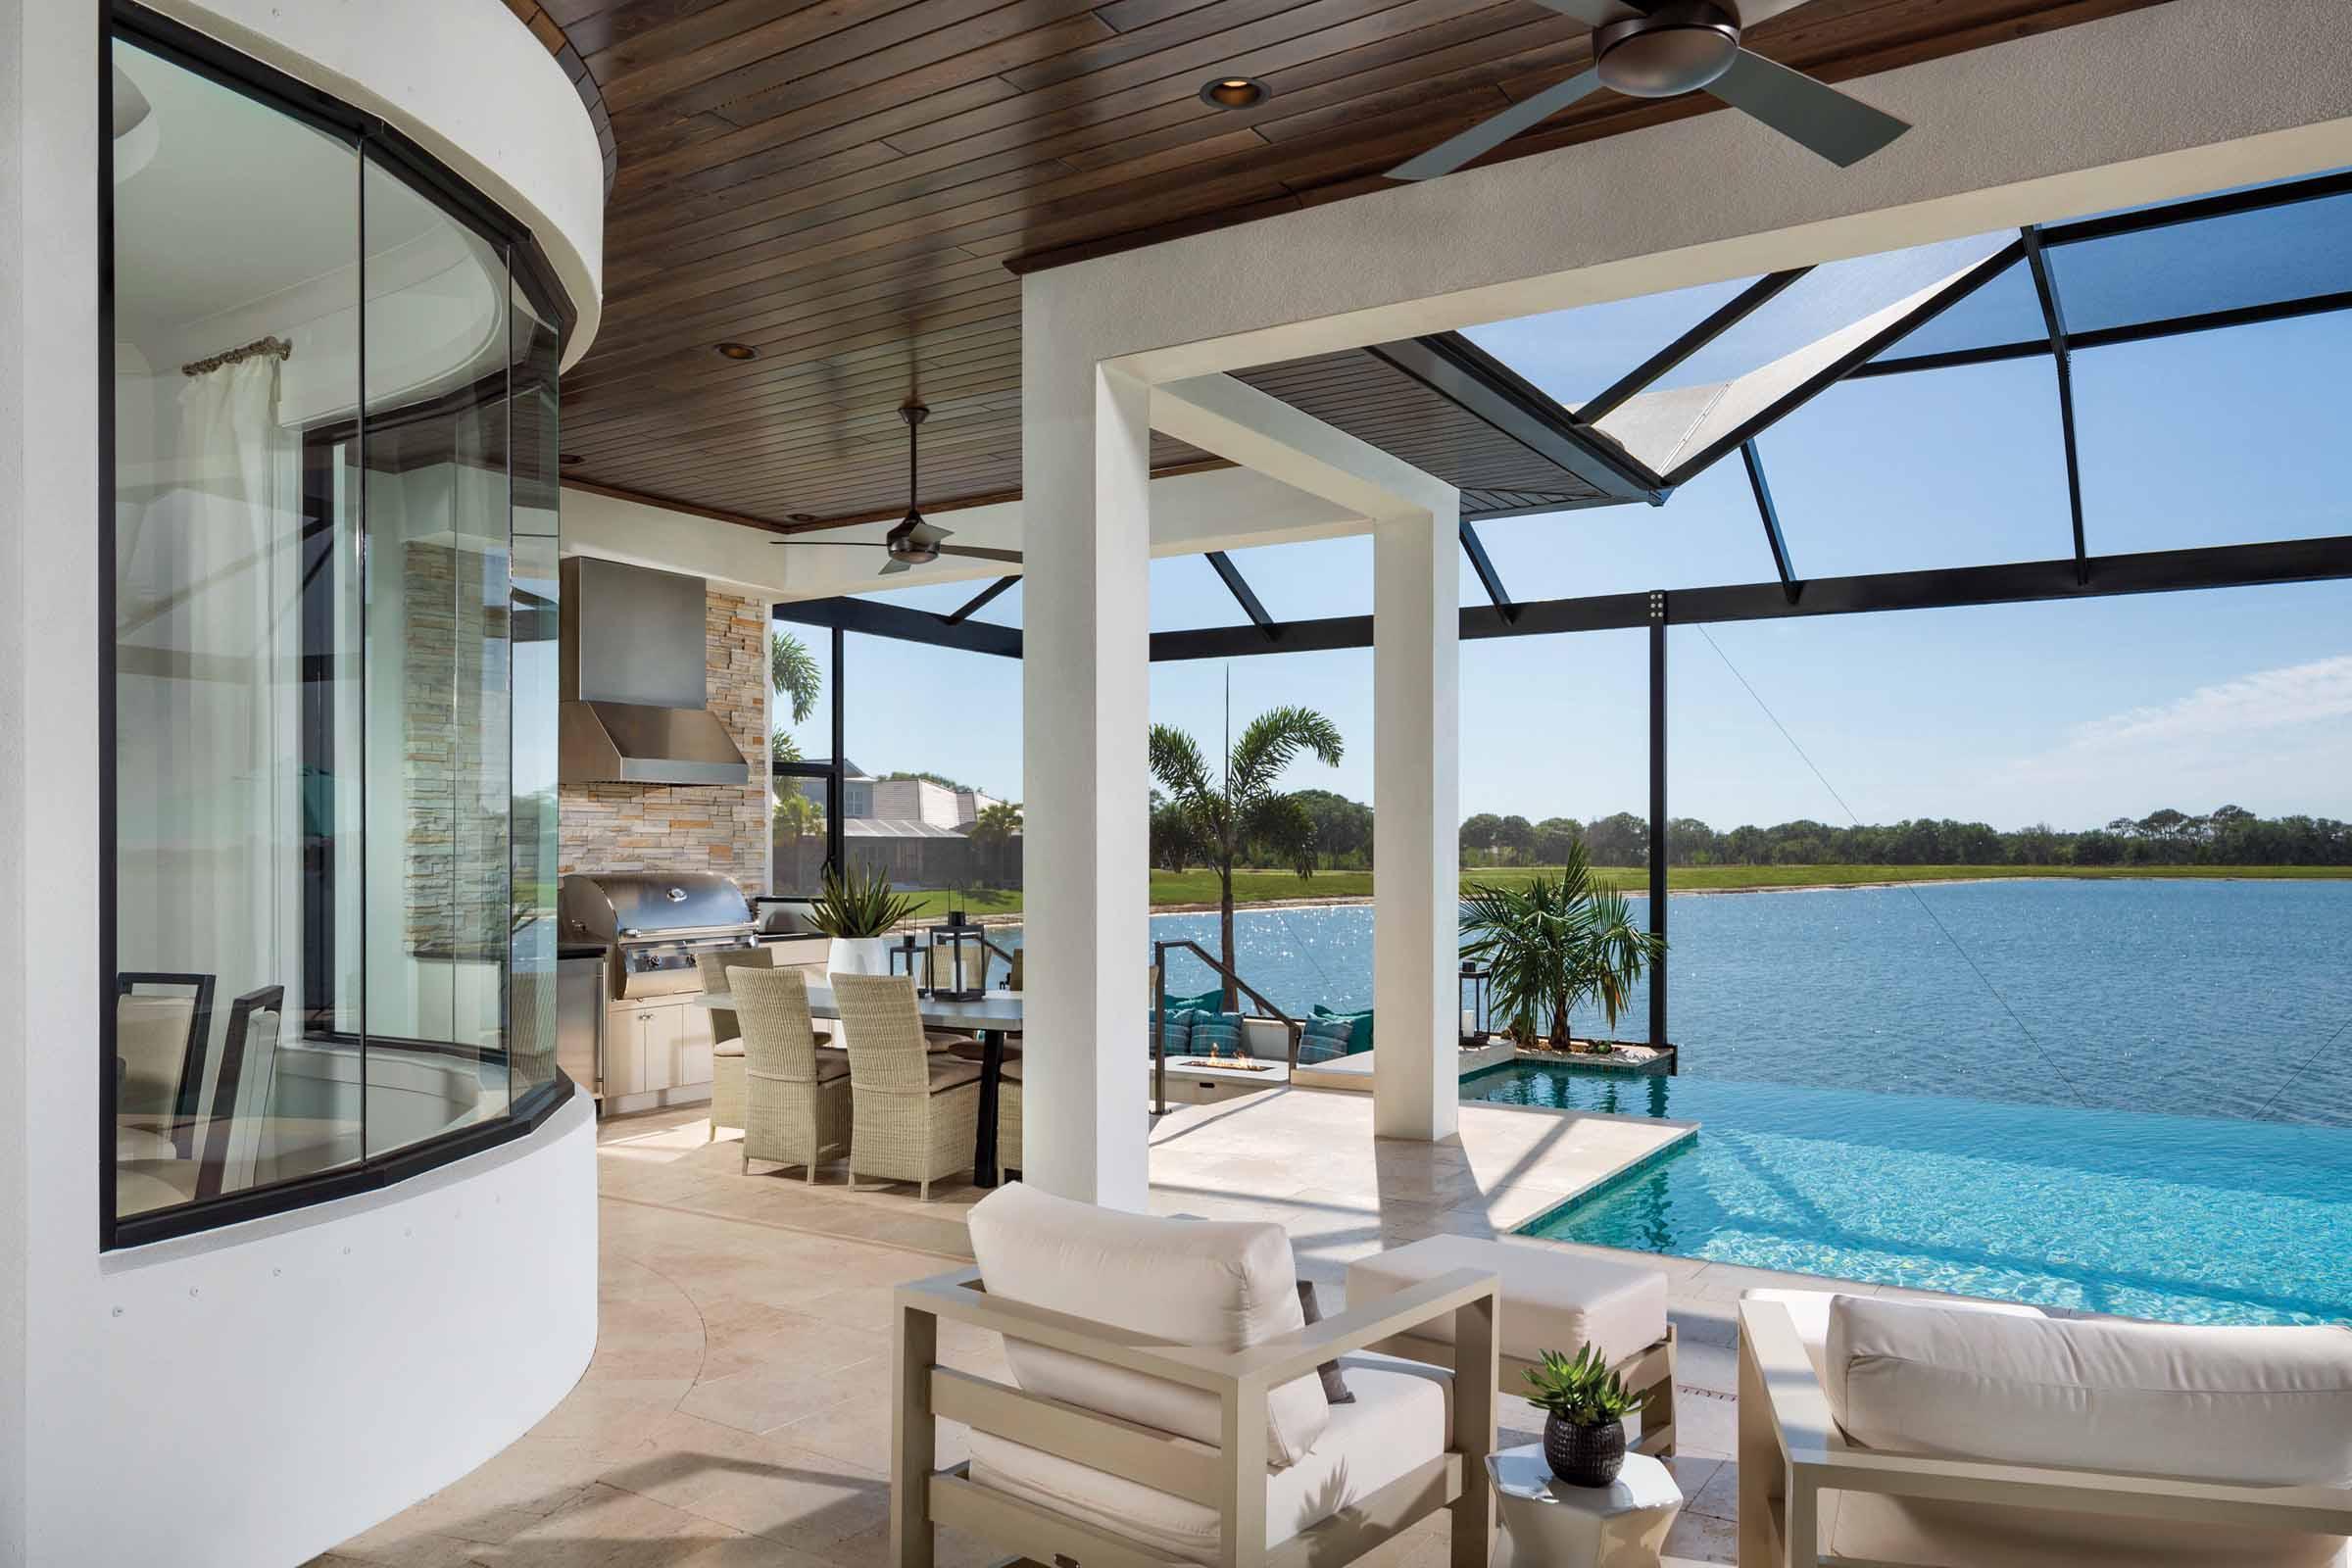 9739 Sandpine Lane, Hobe Sound, Florida 33455, 4 Bedrooms Bedrooms, ,4.1 BathroomsBathrooms,A,Single family,Sandpine,RX-10474730